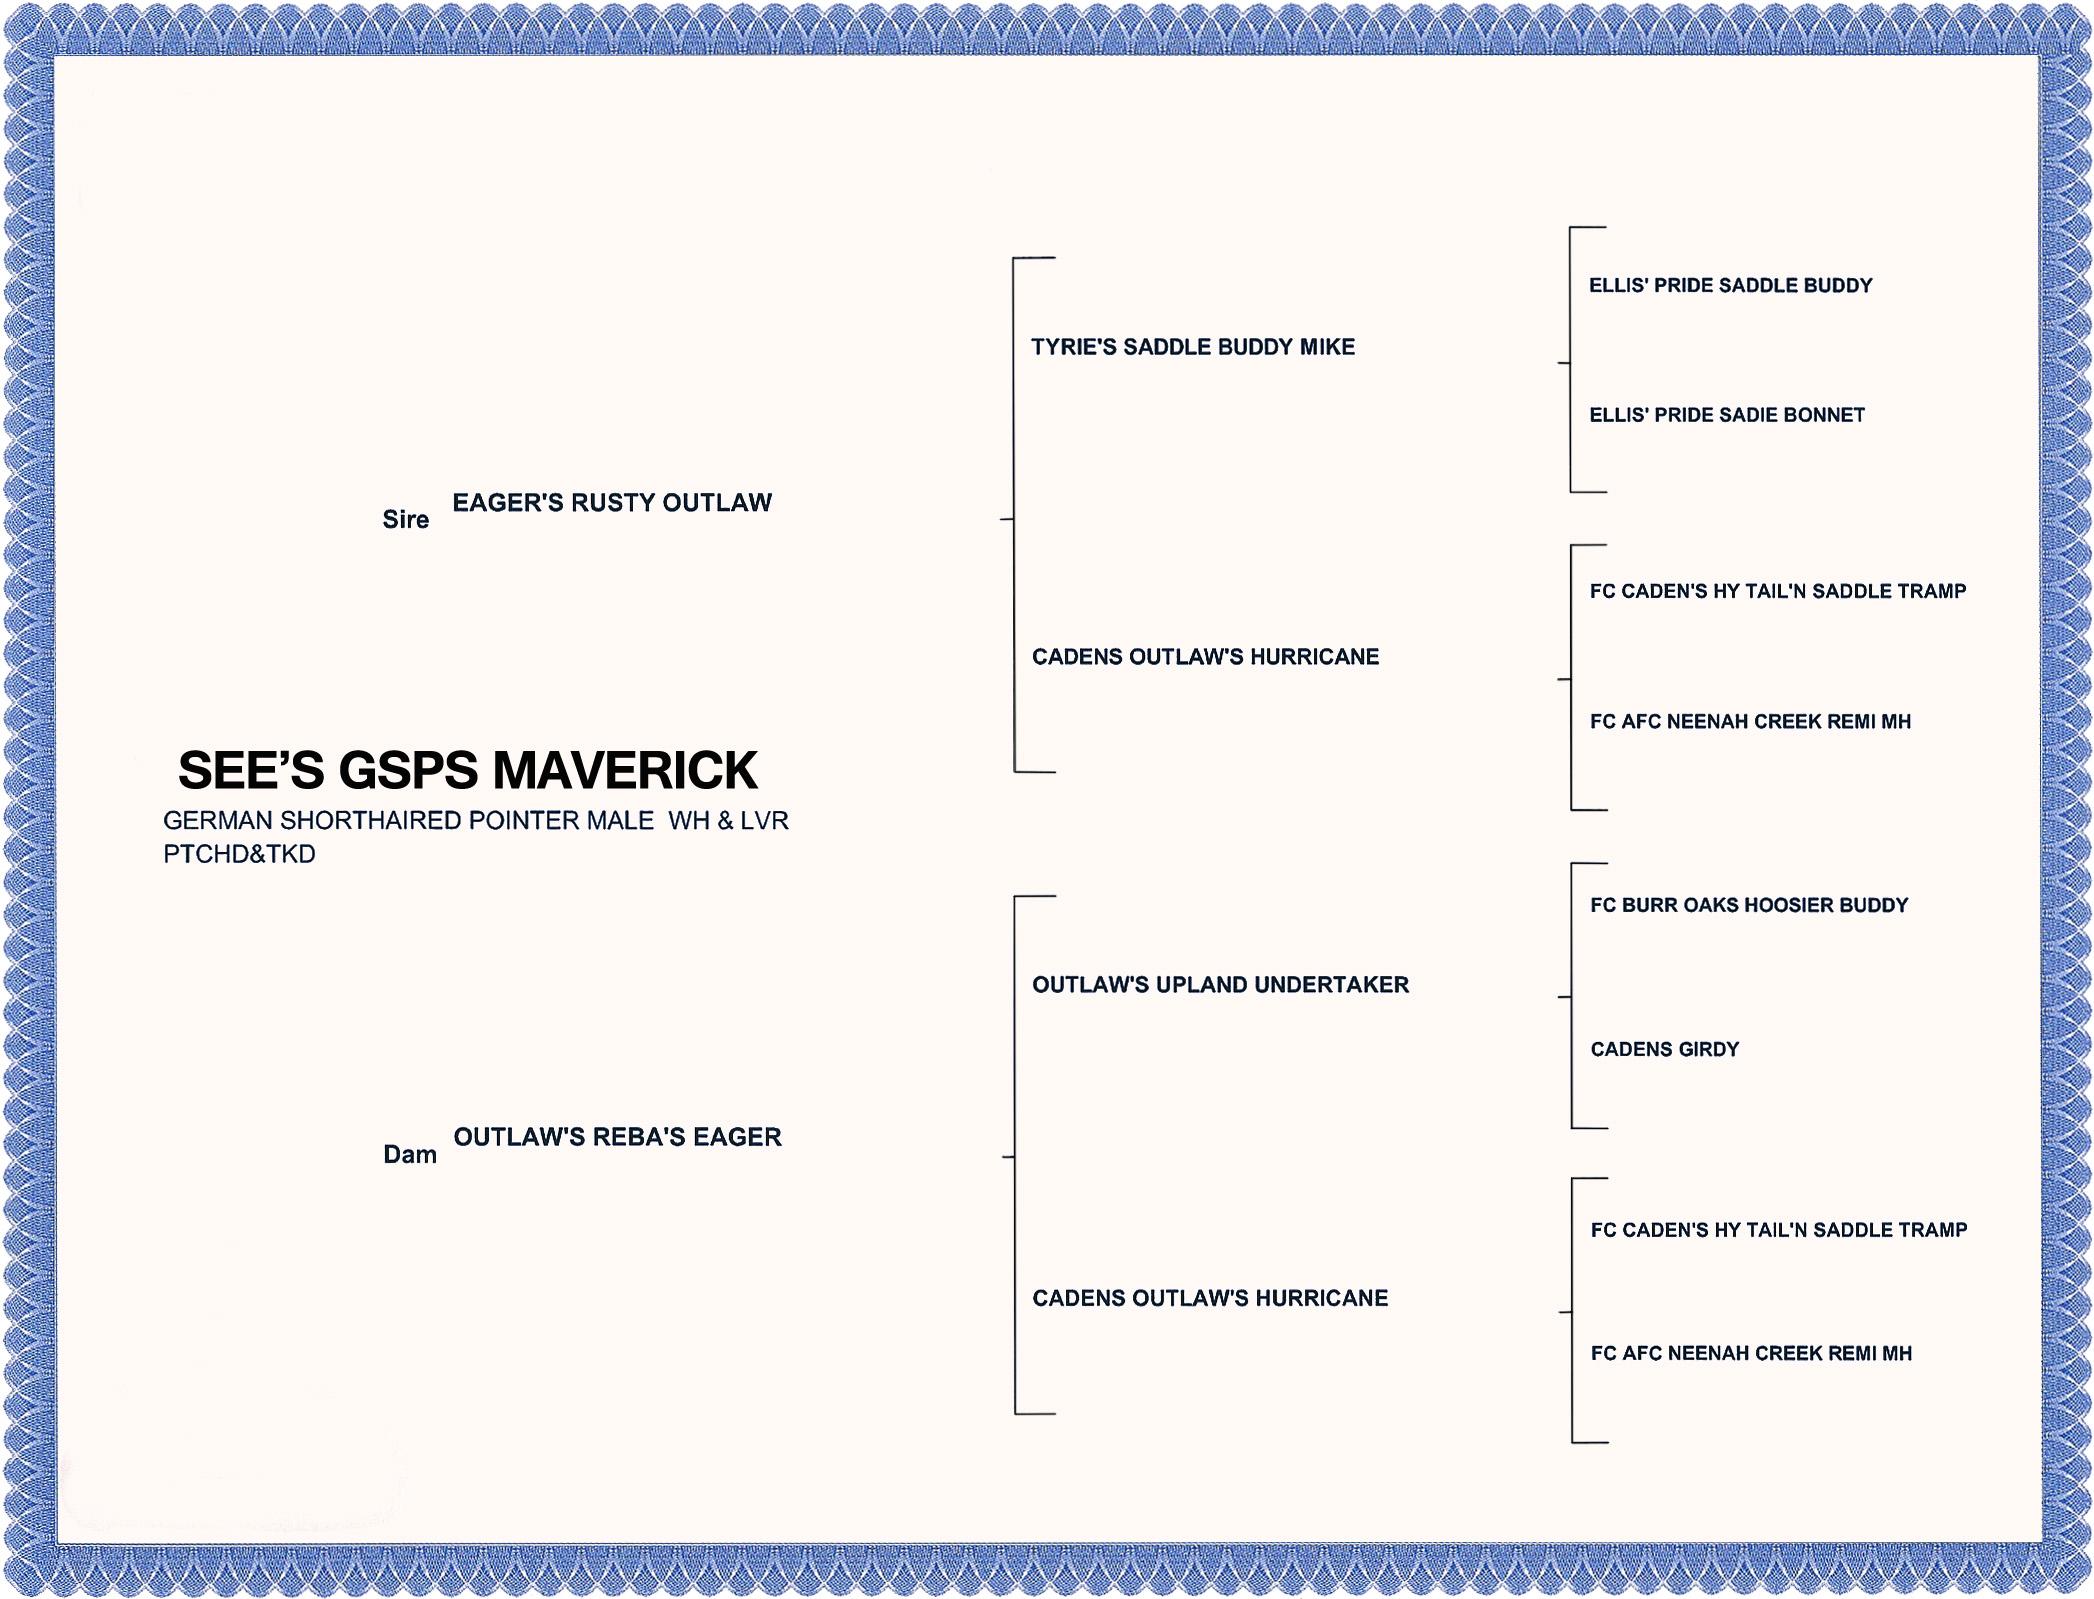 PEDIGREE MAVERICK-NO NUMBERS.jpg